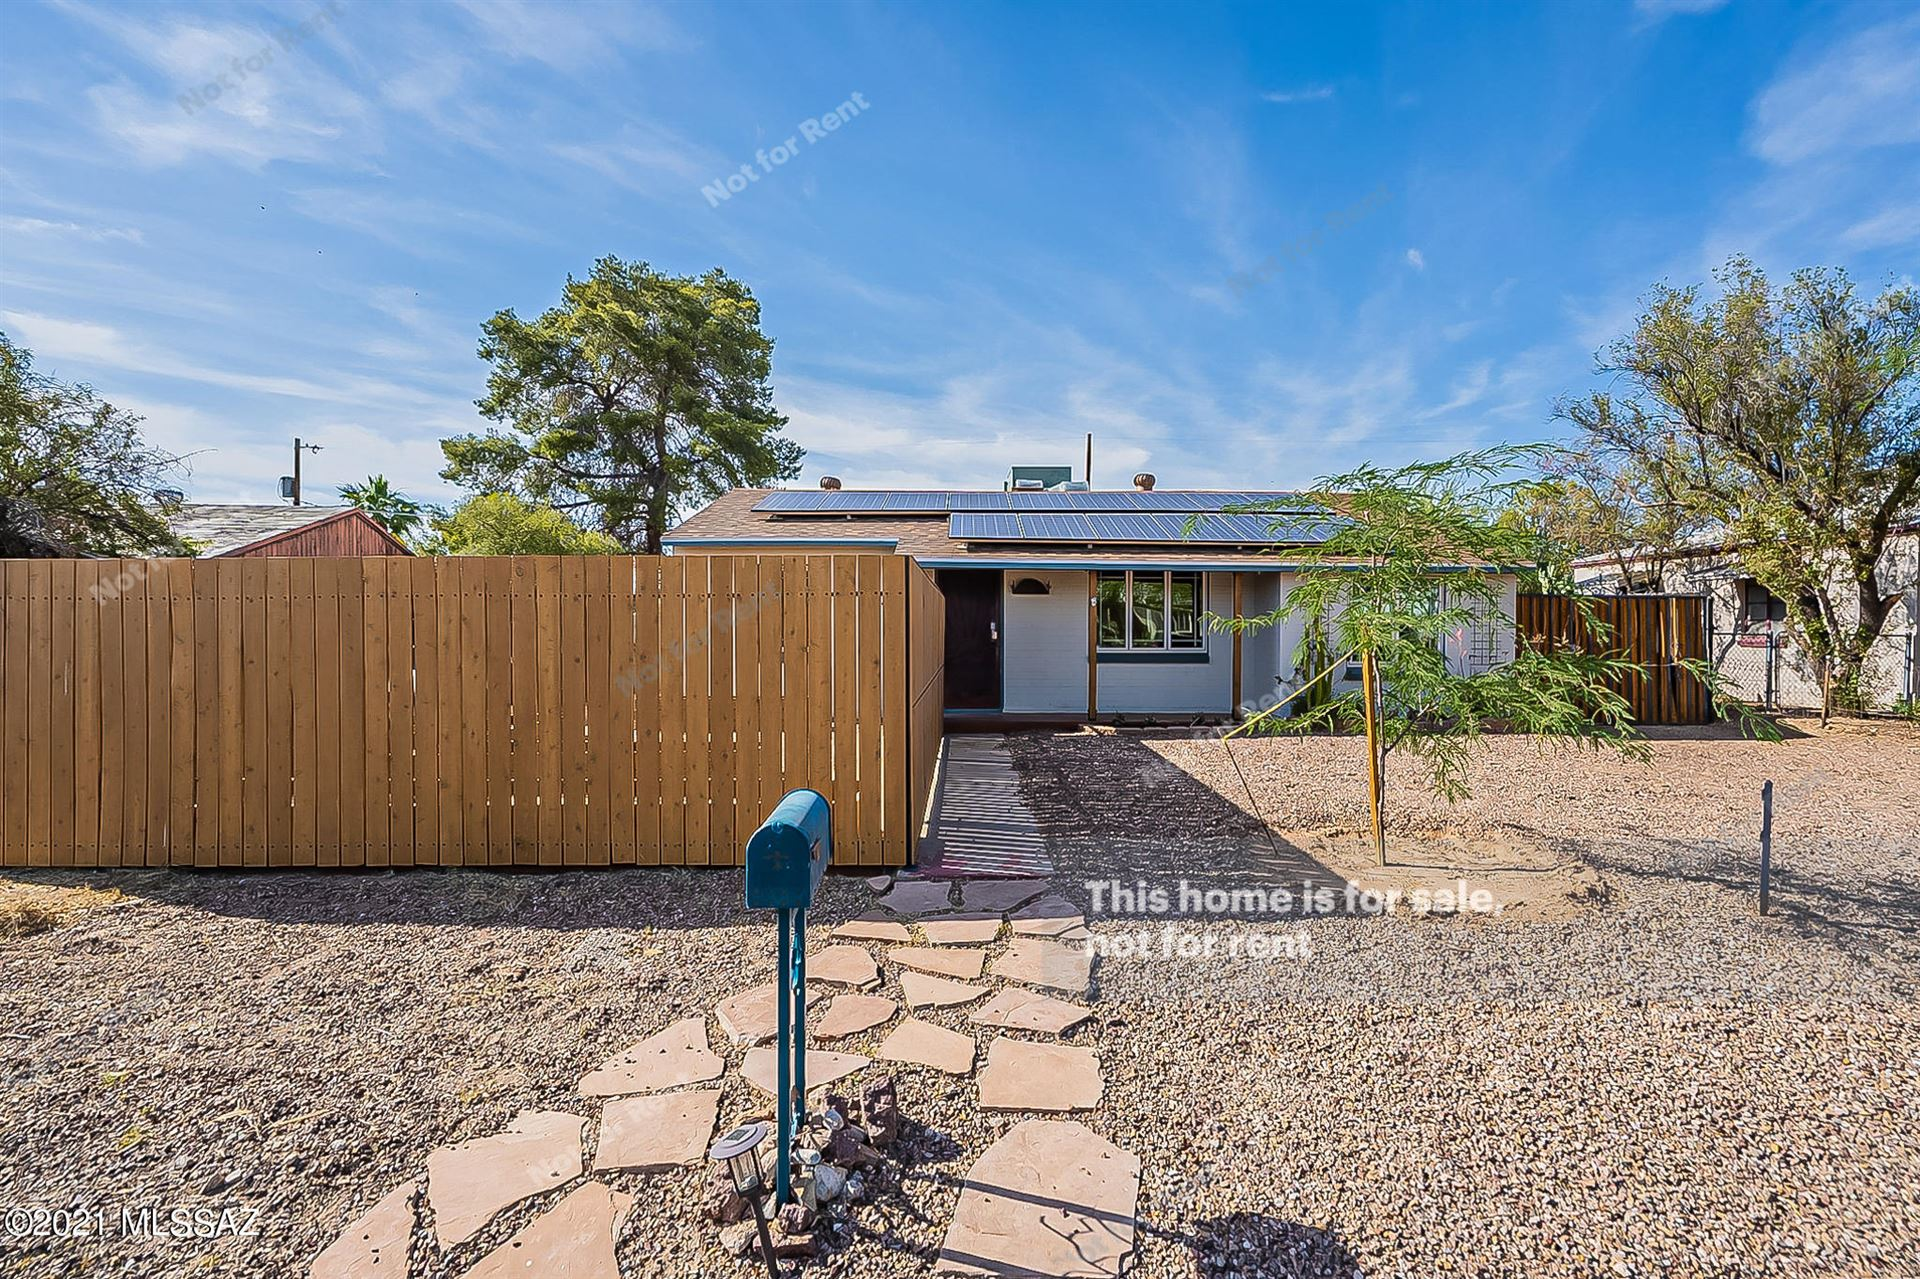 4543 E 7Th Street, Tucson, AZ 85711 - MLS#: 22114223